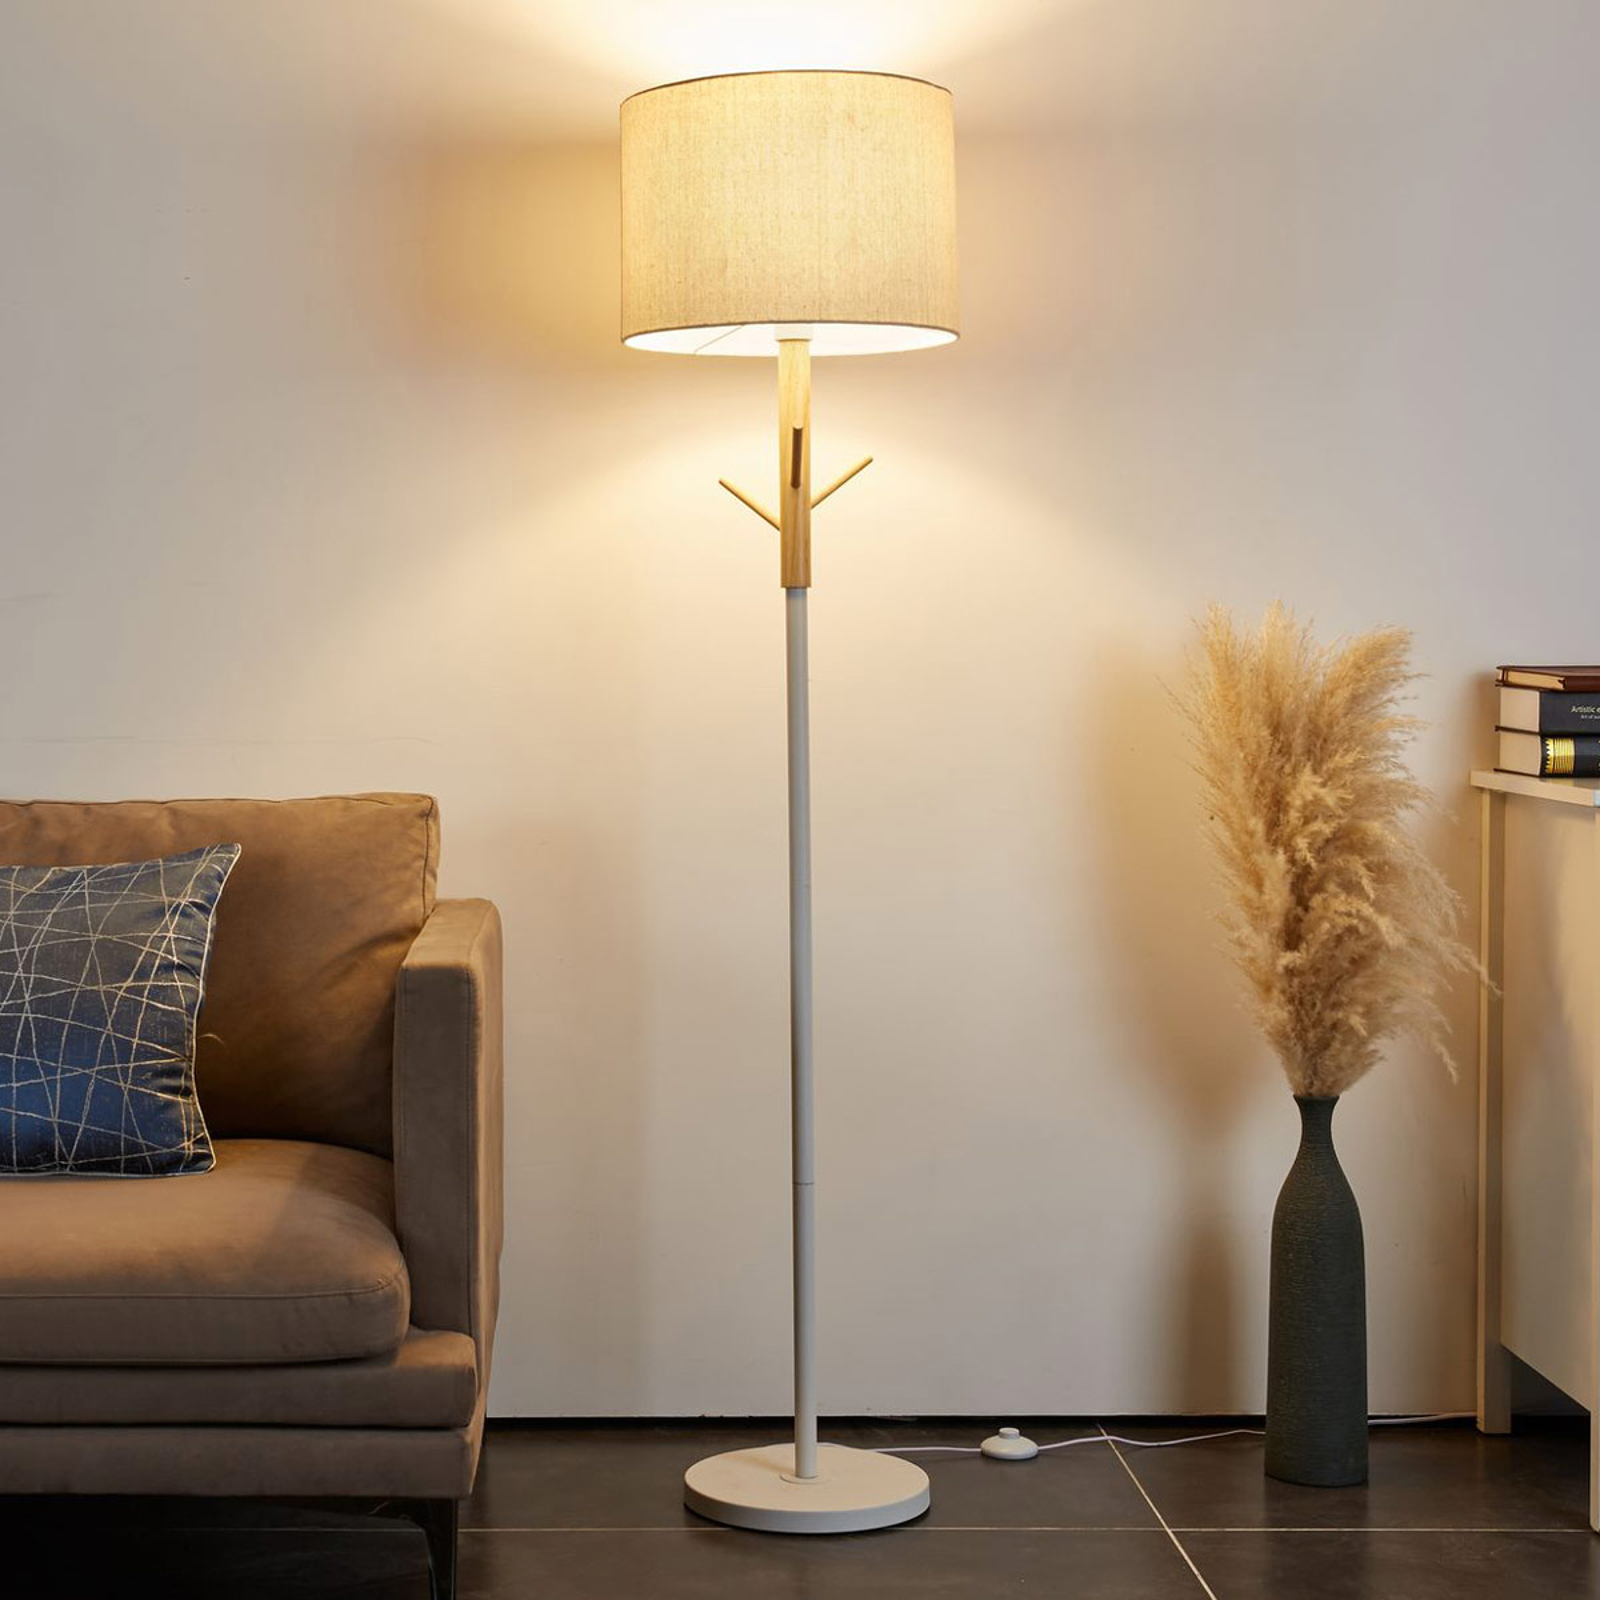 Pauleen Grand Romance Stehlampe mit Holzdetail